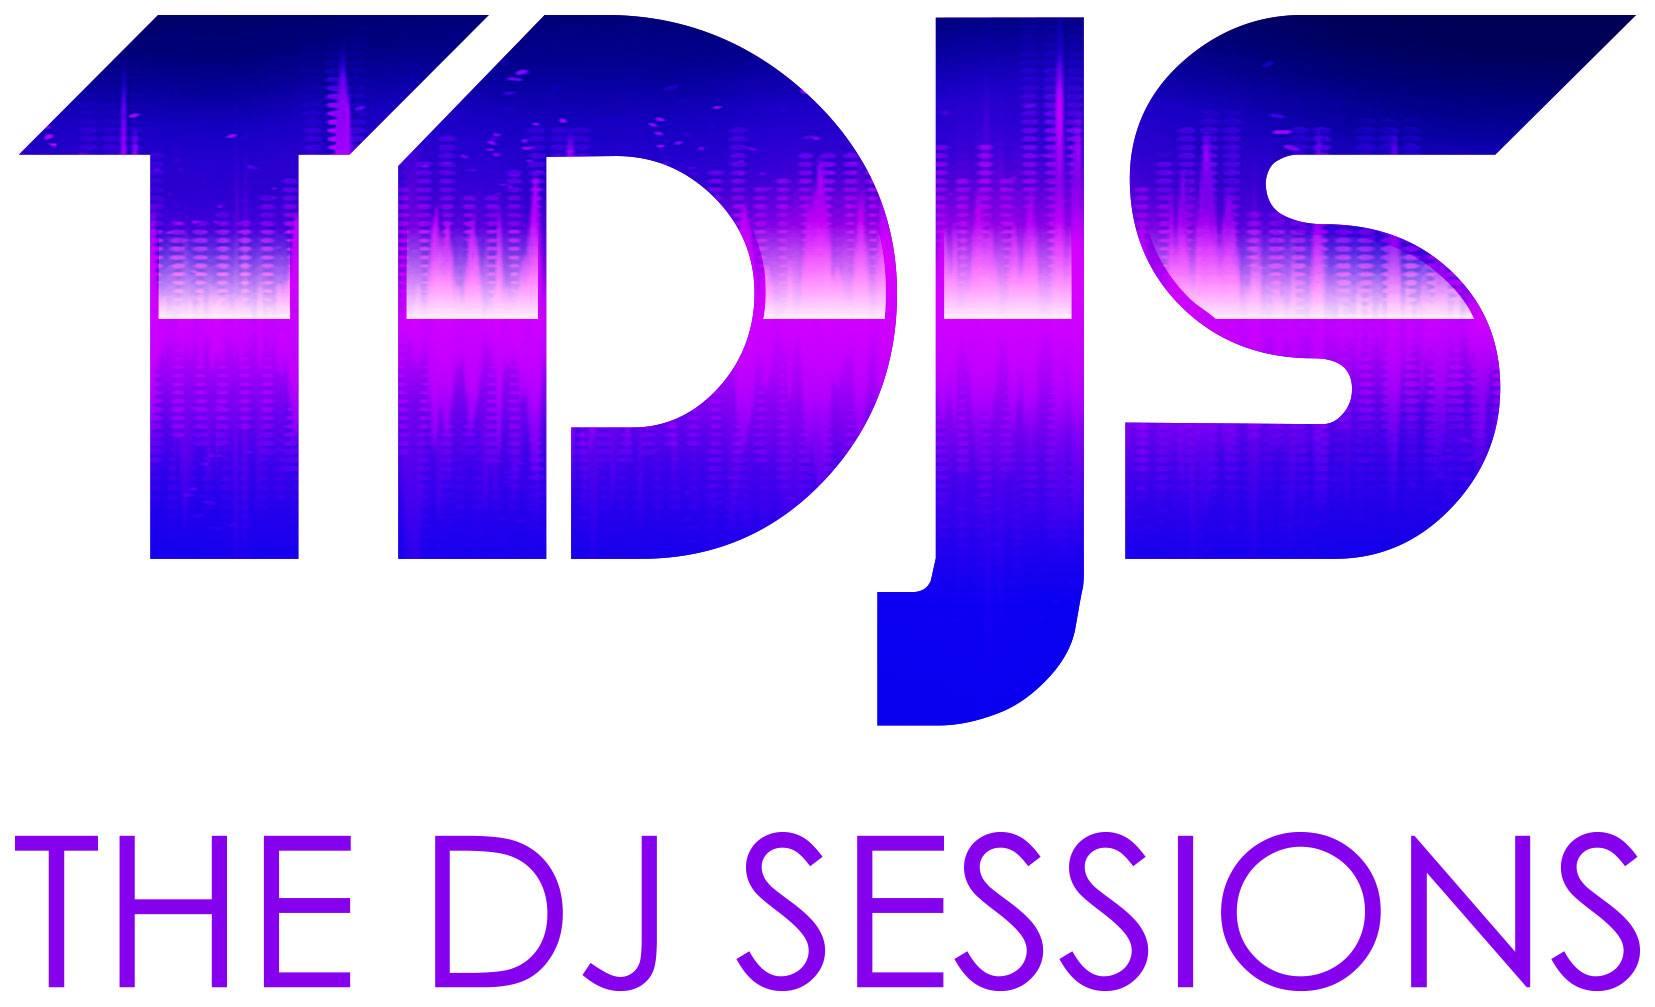 Julie Herrera, David Lowe, Vagabond Superstar & Trinitron/DJ SESSIONS on the Wave Rooftop [FREE]